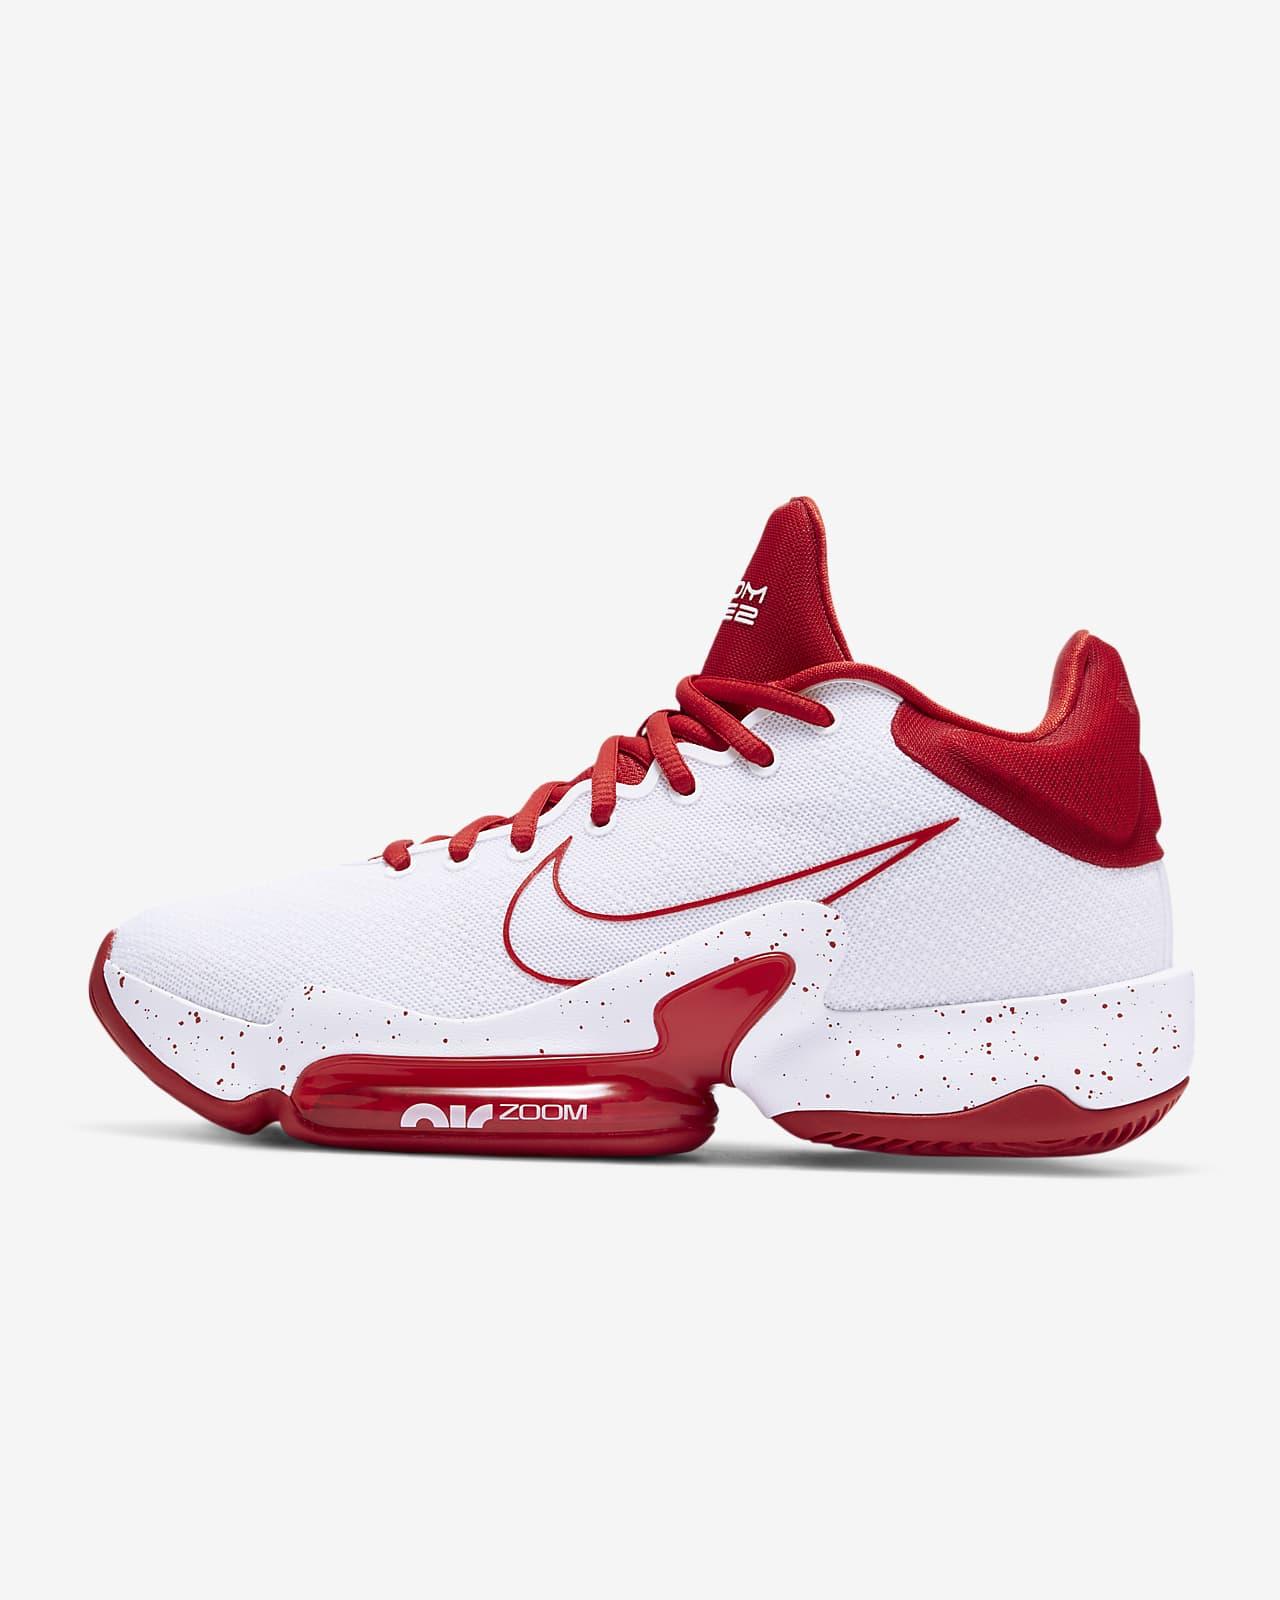 Nike Zoom Rize 2 EP (Team) Basketball Shoe